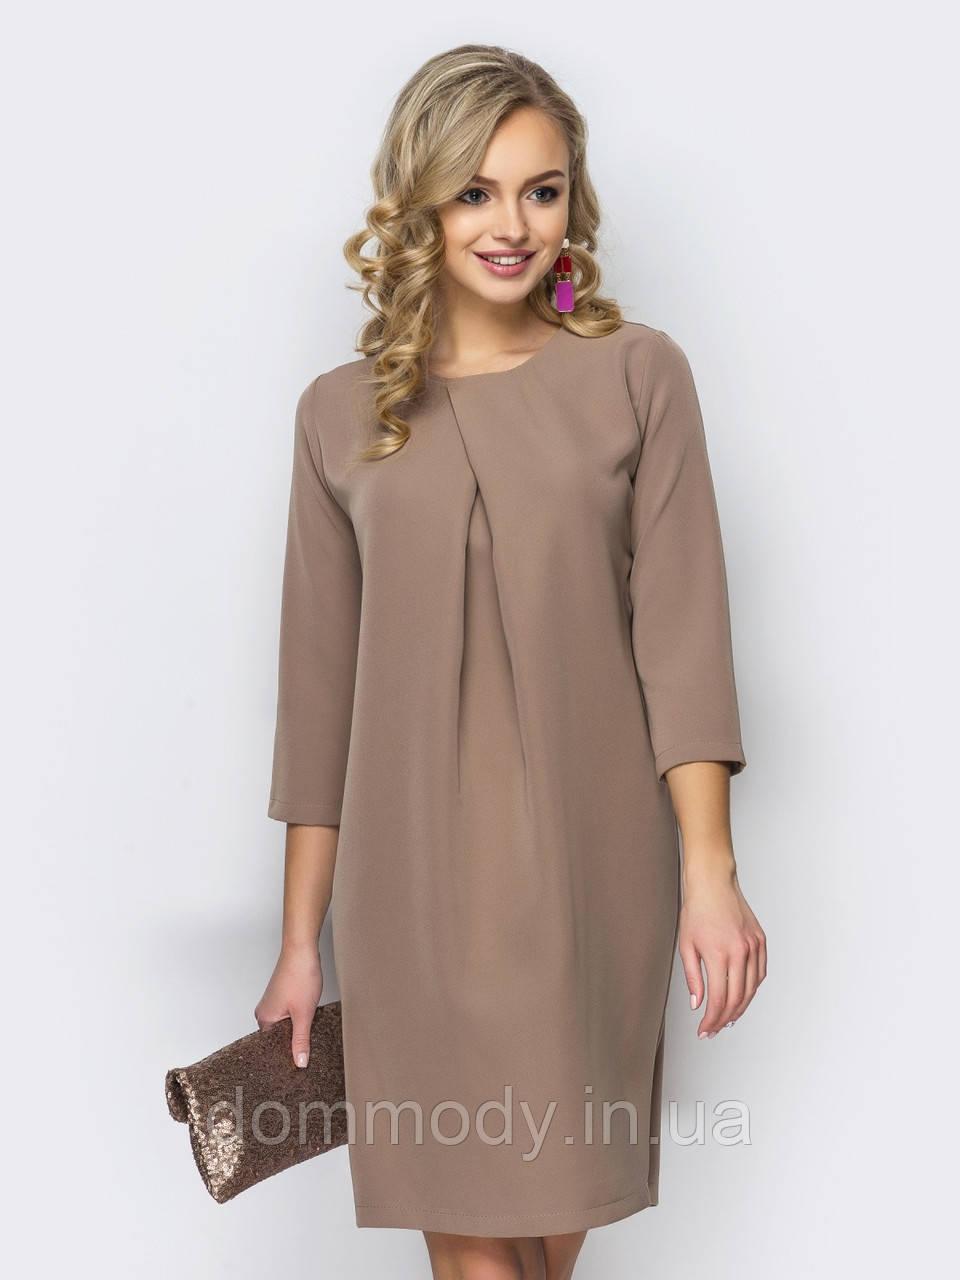 Платье женское Maria beige